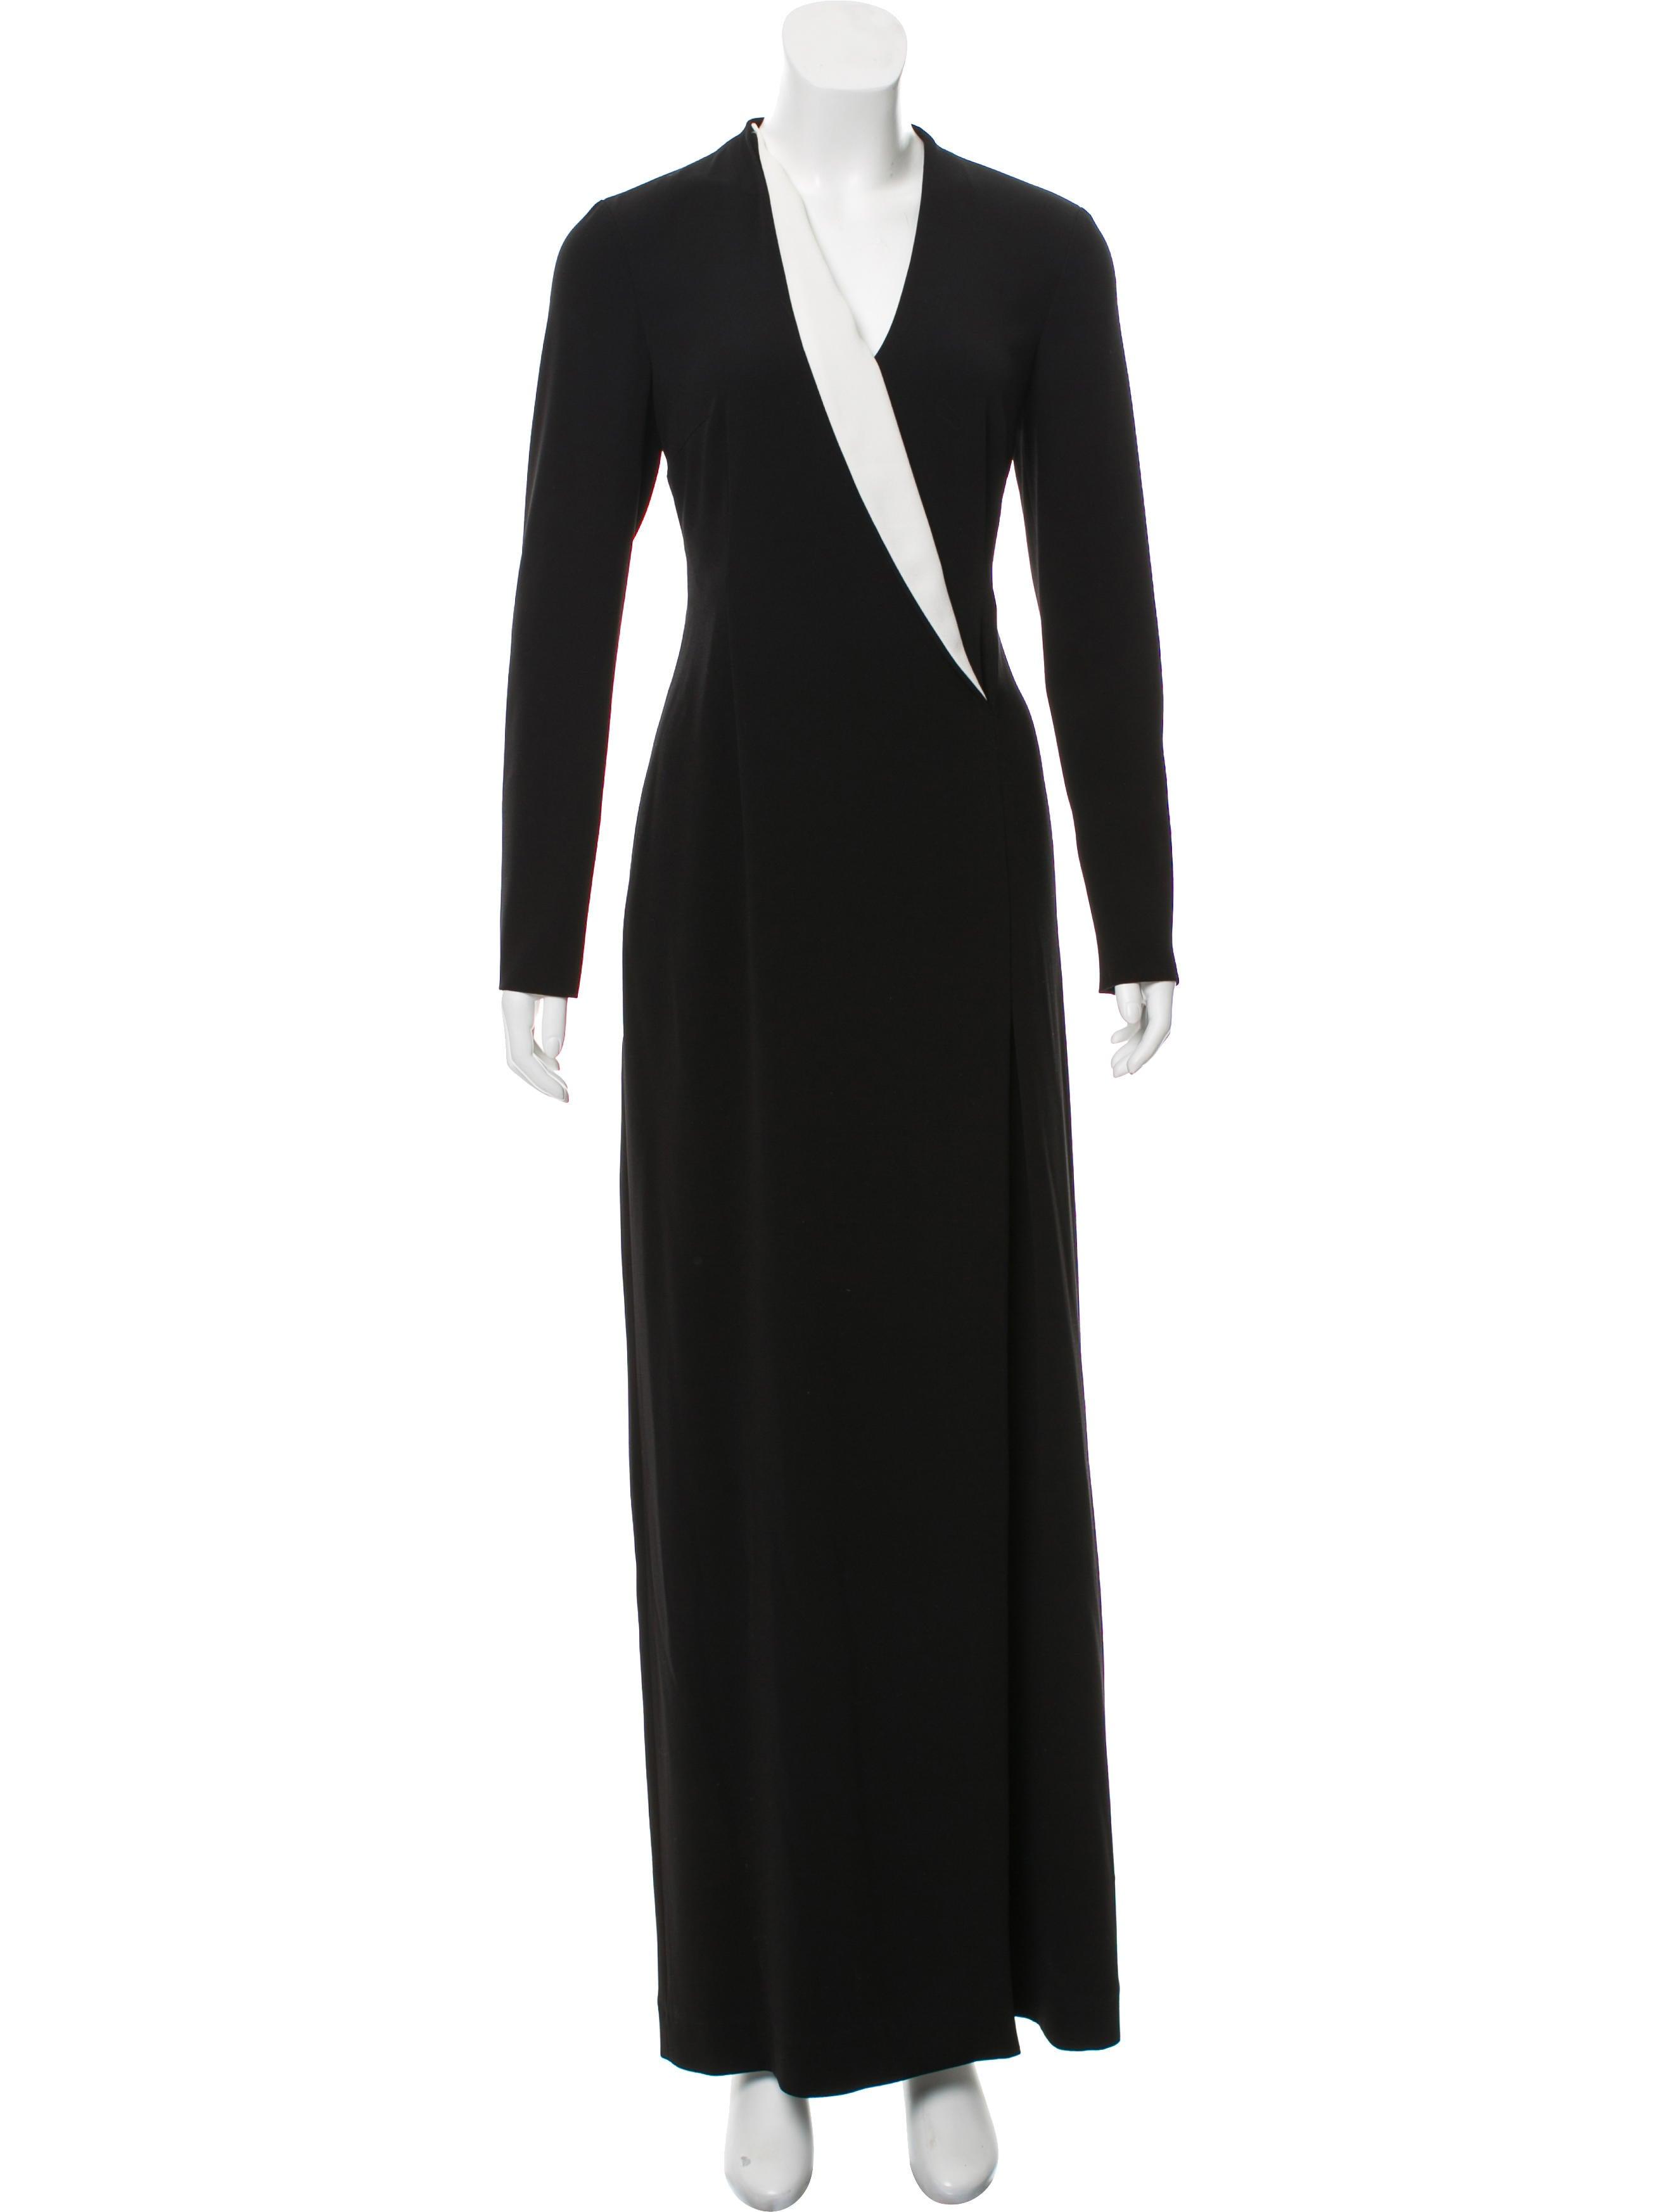 Lk Bennett Long Sleeve Maxi Dress W Tags Clothing W9z21493